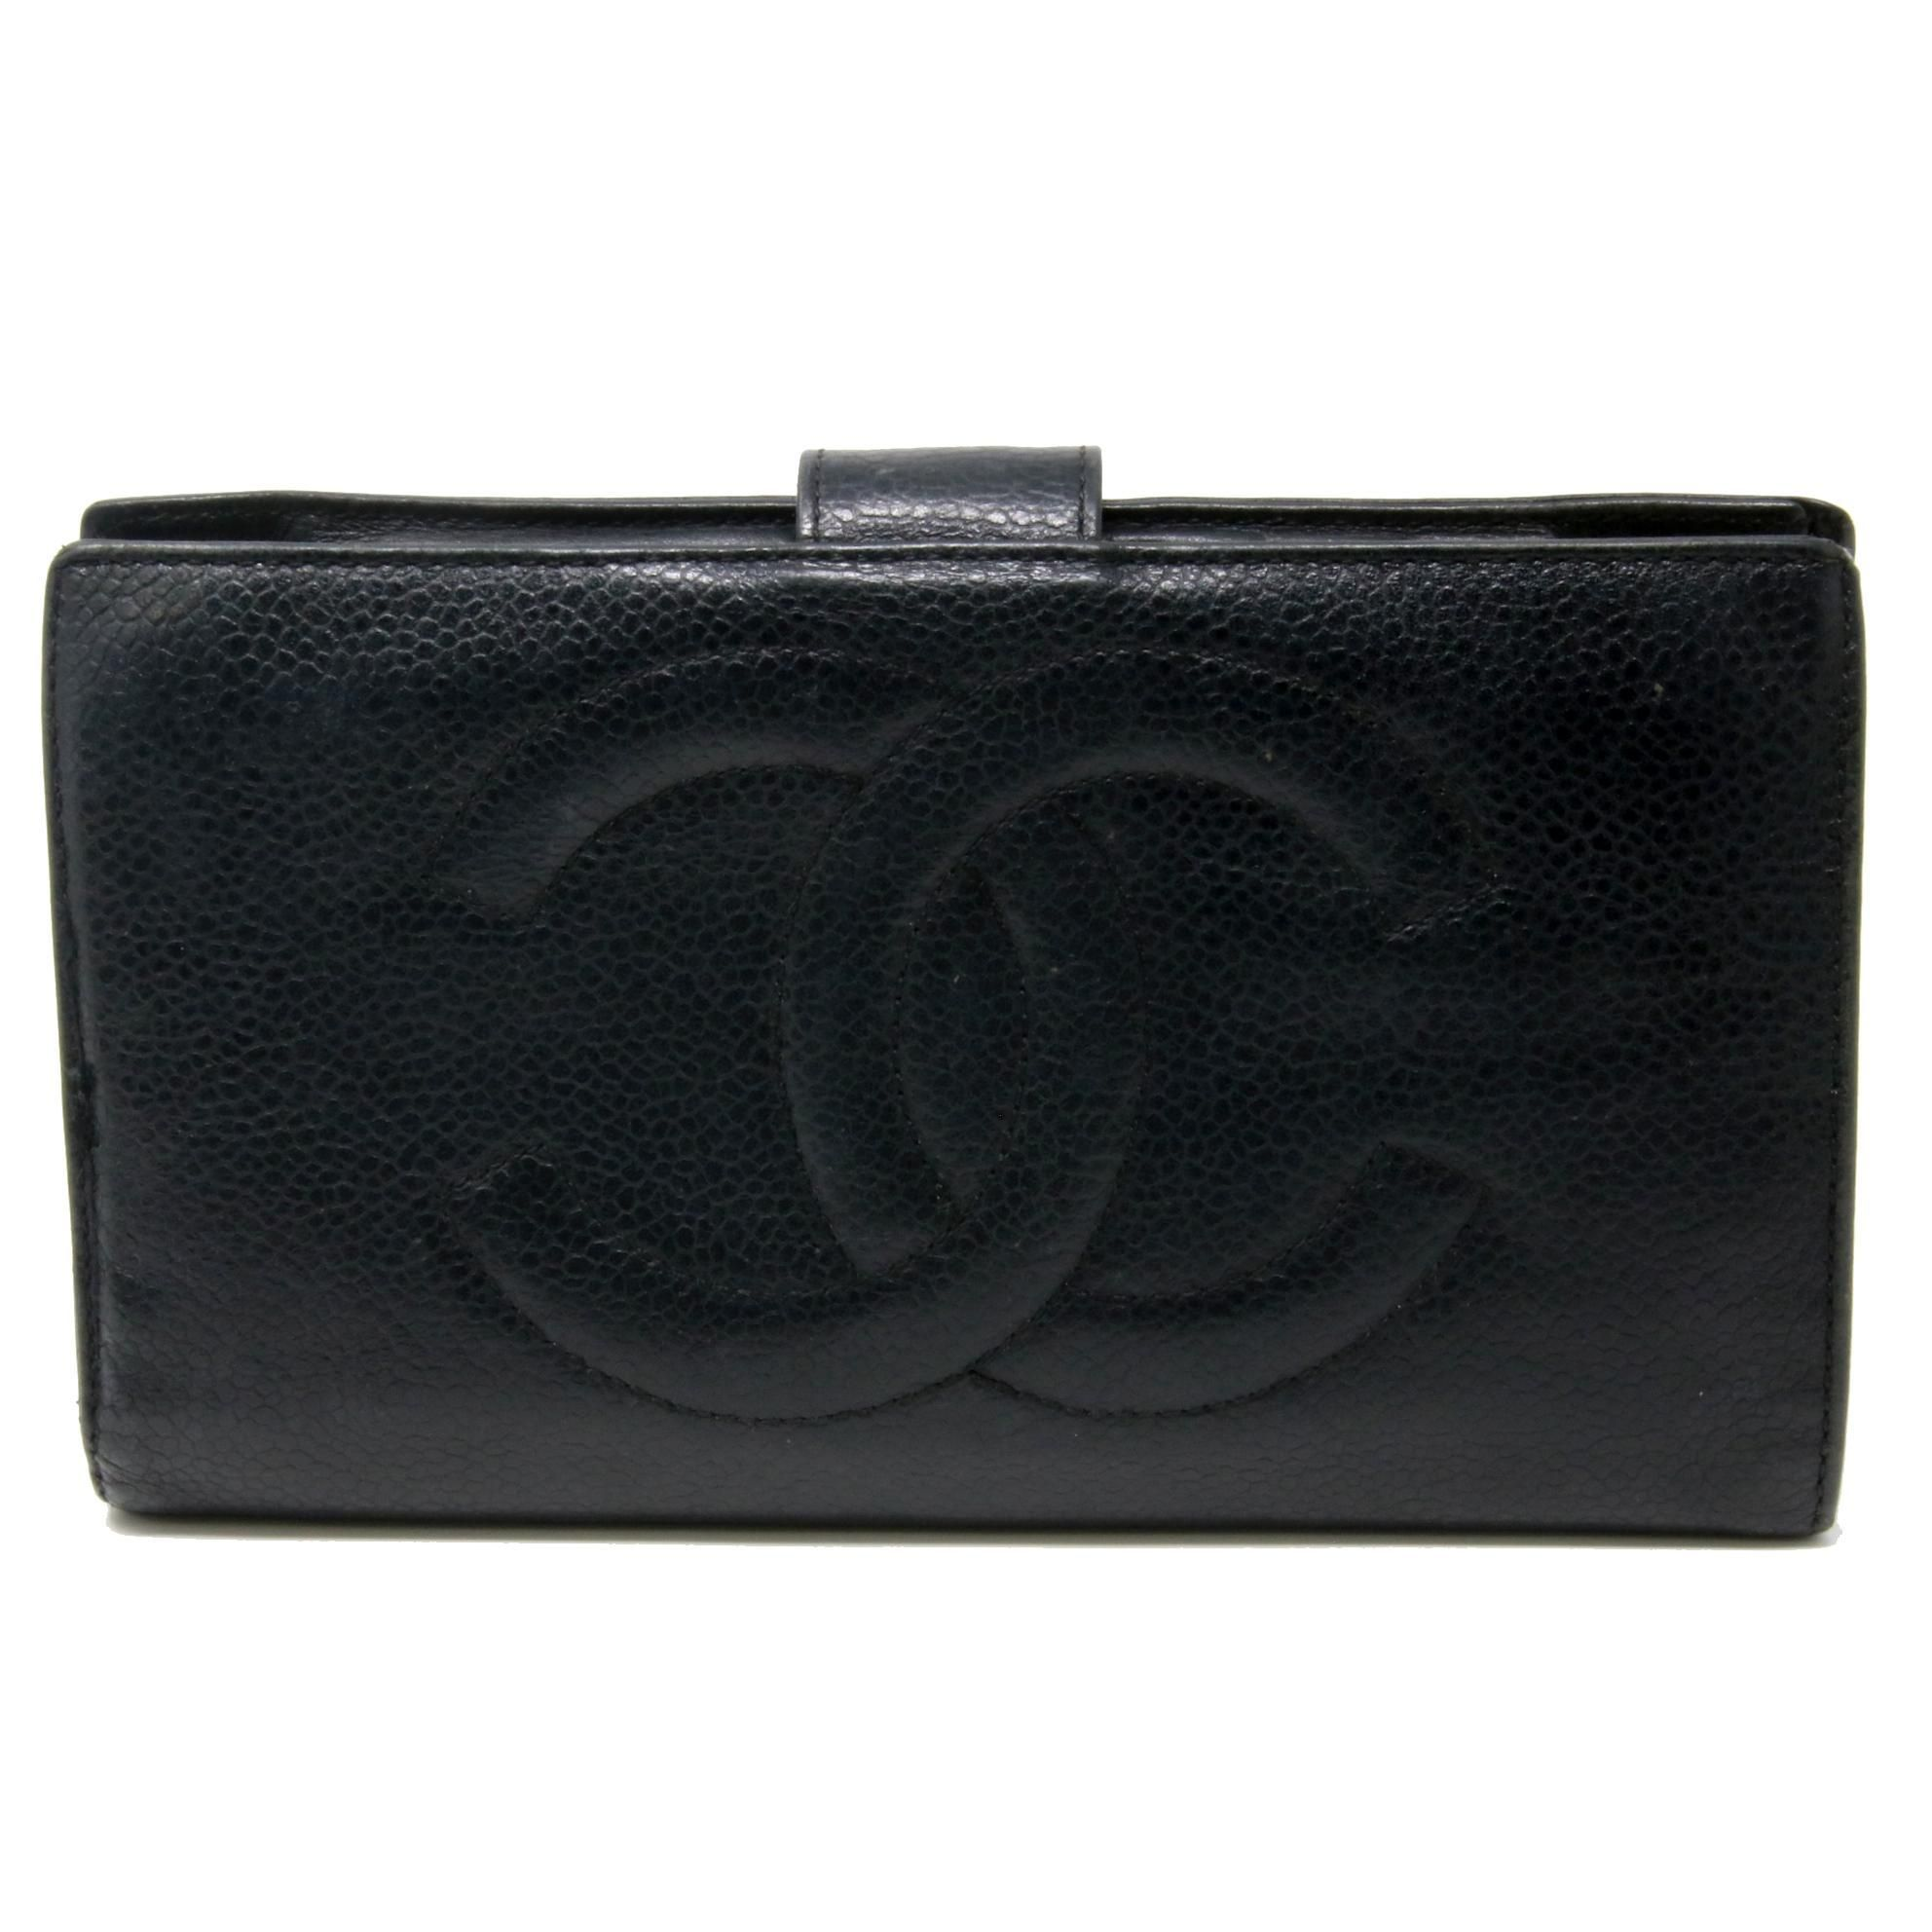 3b74f8a8 Chanel CC Logo Caviar Lambskin Leather Long Bifold Snap Black Wallet ...